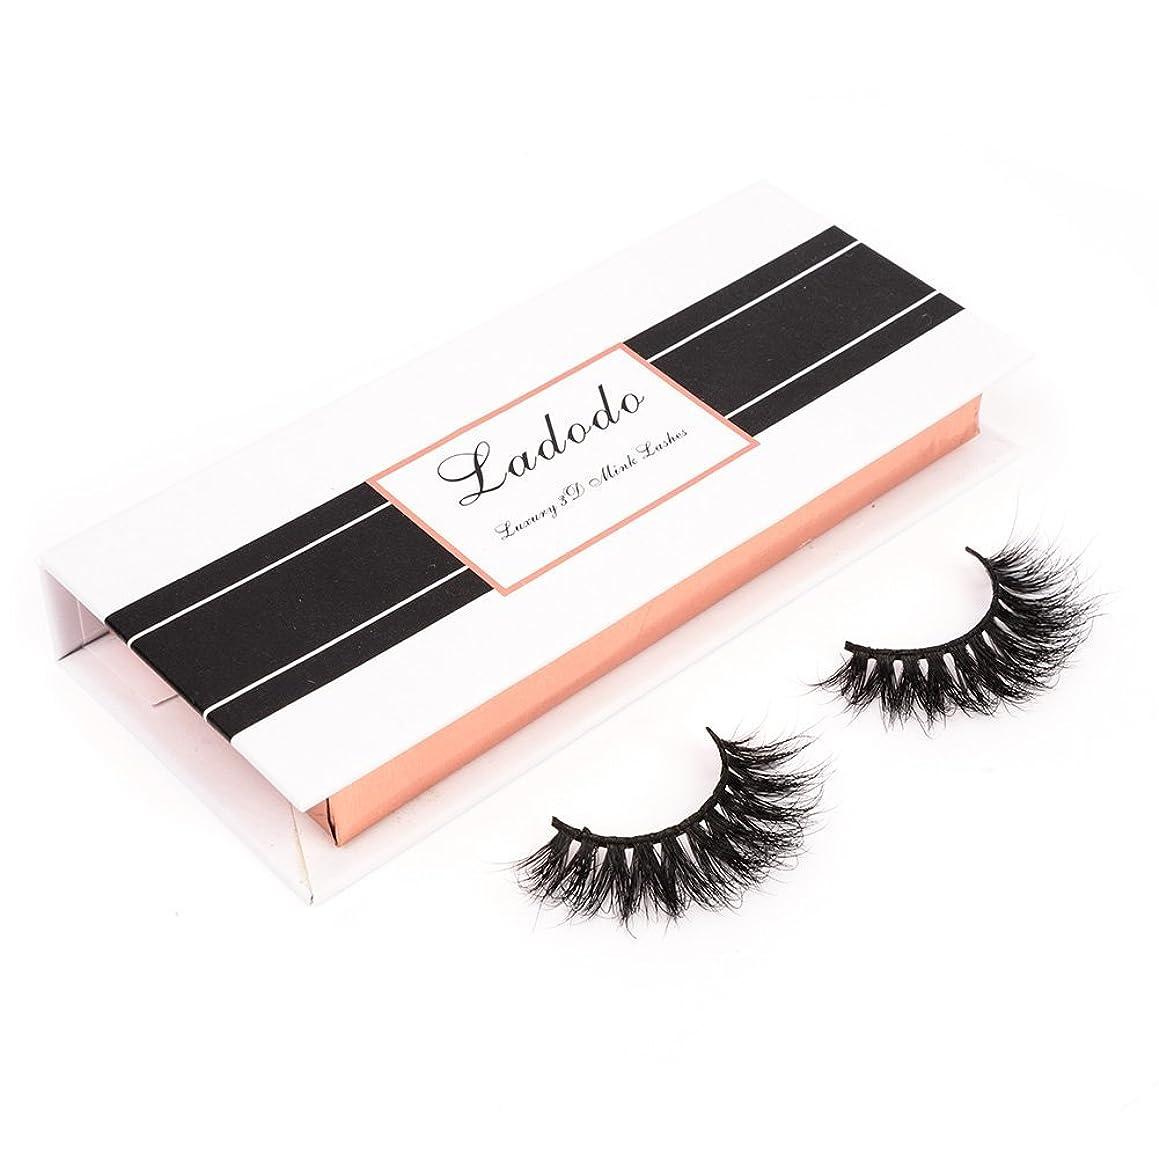 Ladodo 3D False luxury Eyelashes 100% Siberian Mink Fur Hand-Made Fake Eye Lashes Natural Fluffy Wispy Long Thick Reusable, 1 Pair/Box, 001